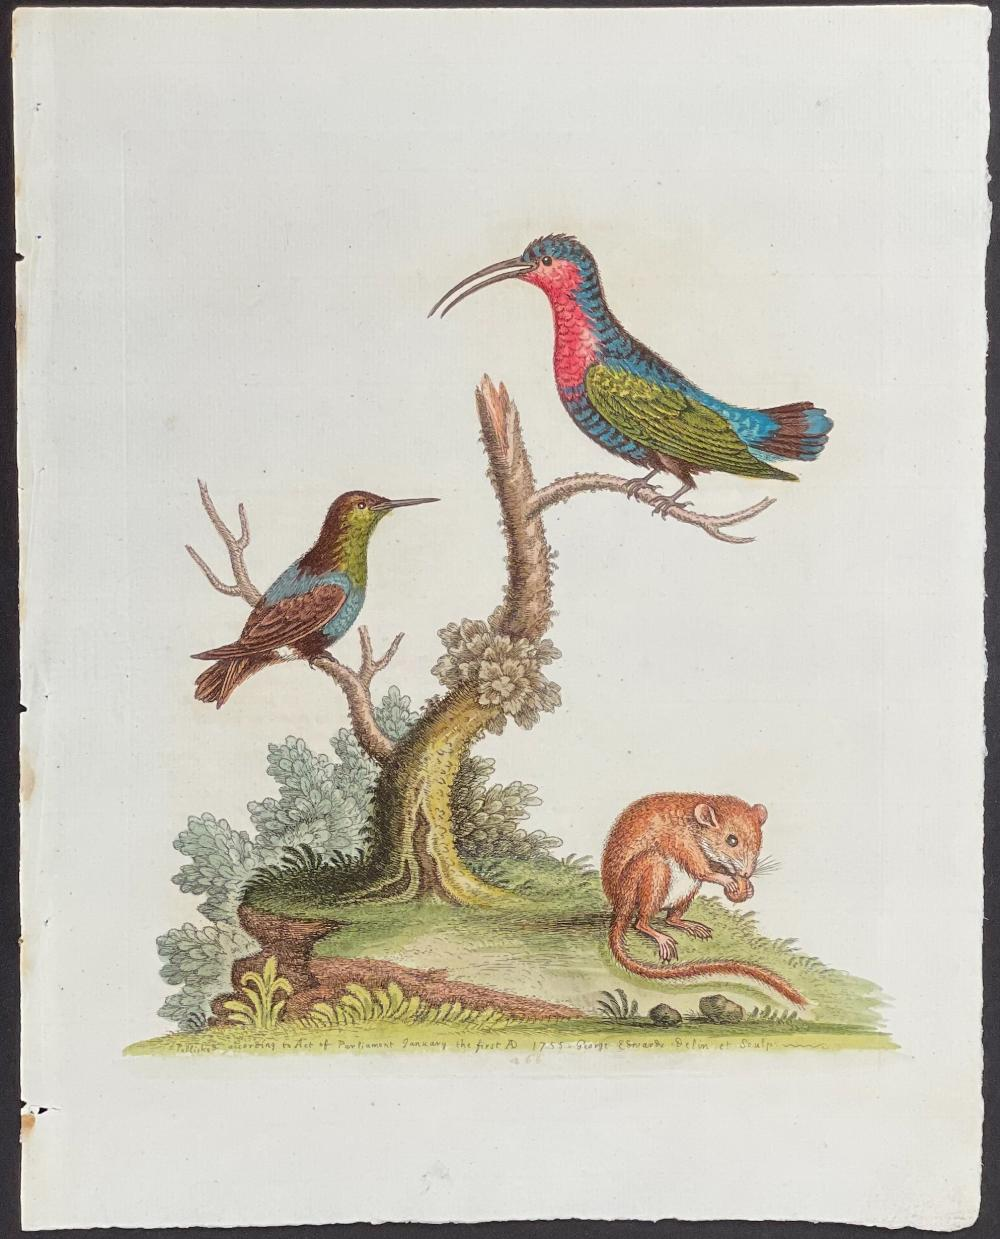 Edwards - Red-breasted Hummingbird & Green-throated Hummingbird & Dormouse. 266